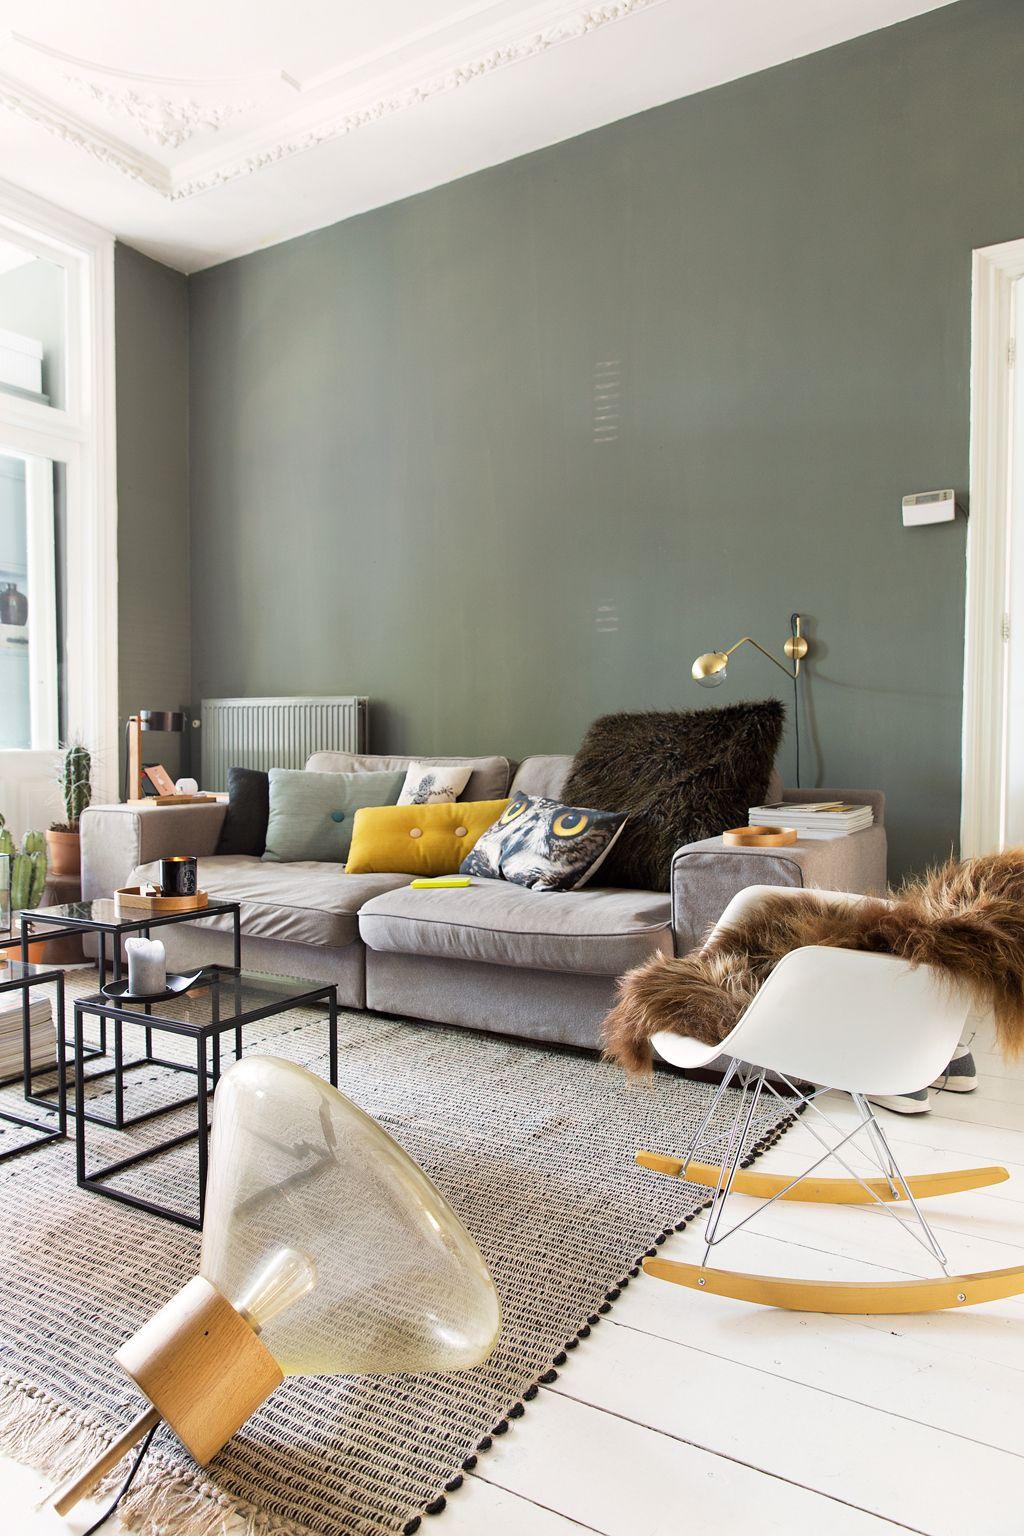 flexa creation early dew : A Grey Dutch Apartment Inside Outside Pinterest Apartments